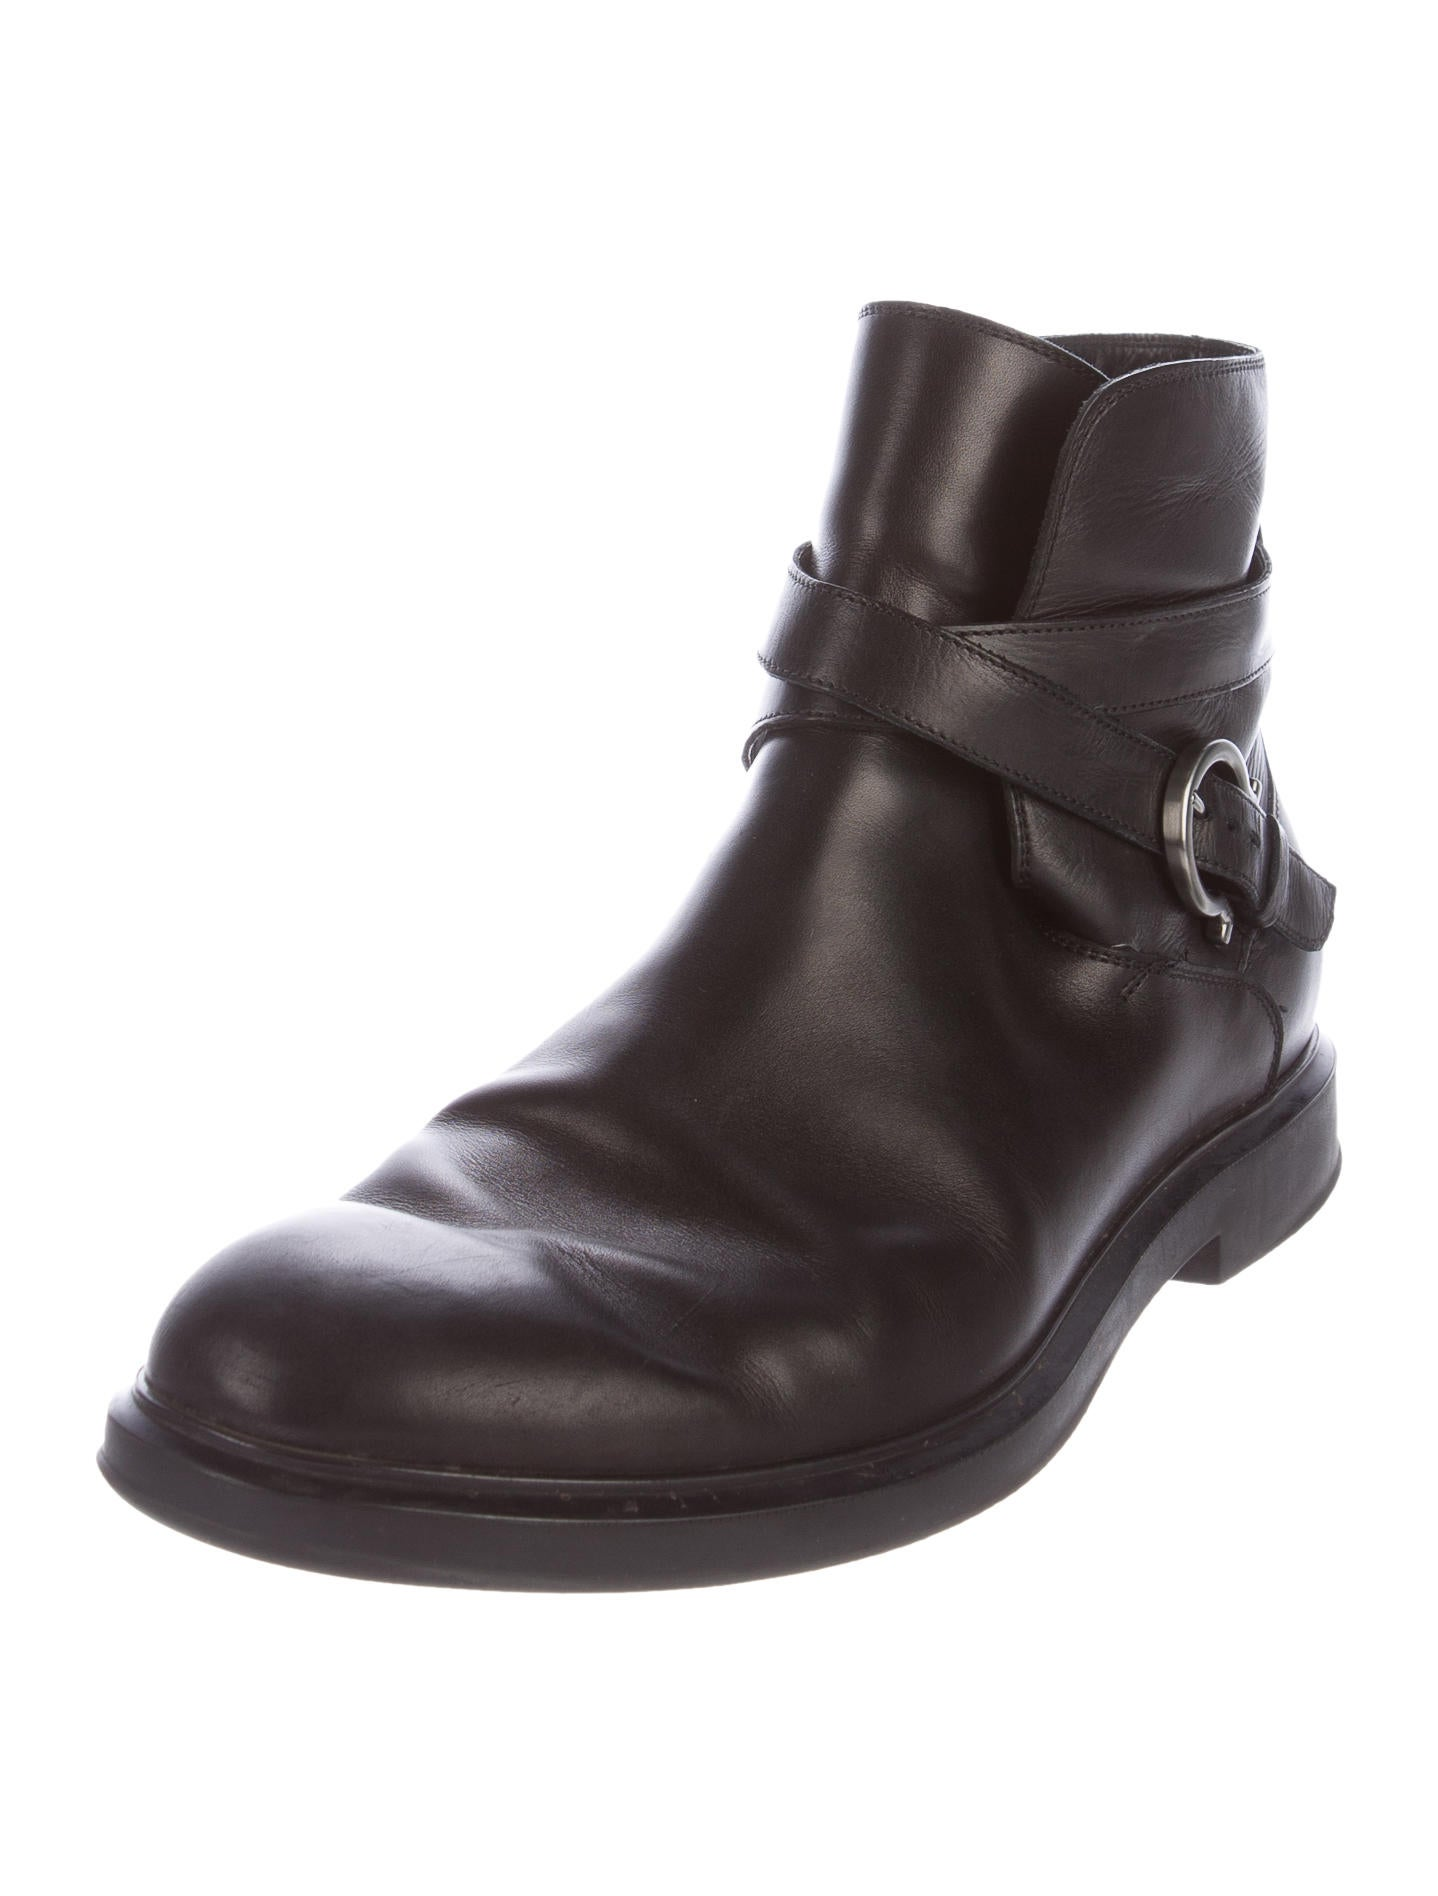 salvatore ferragamo leather combat boots shoes